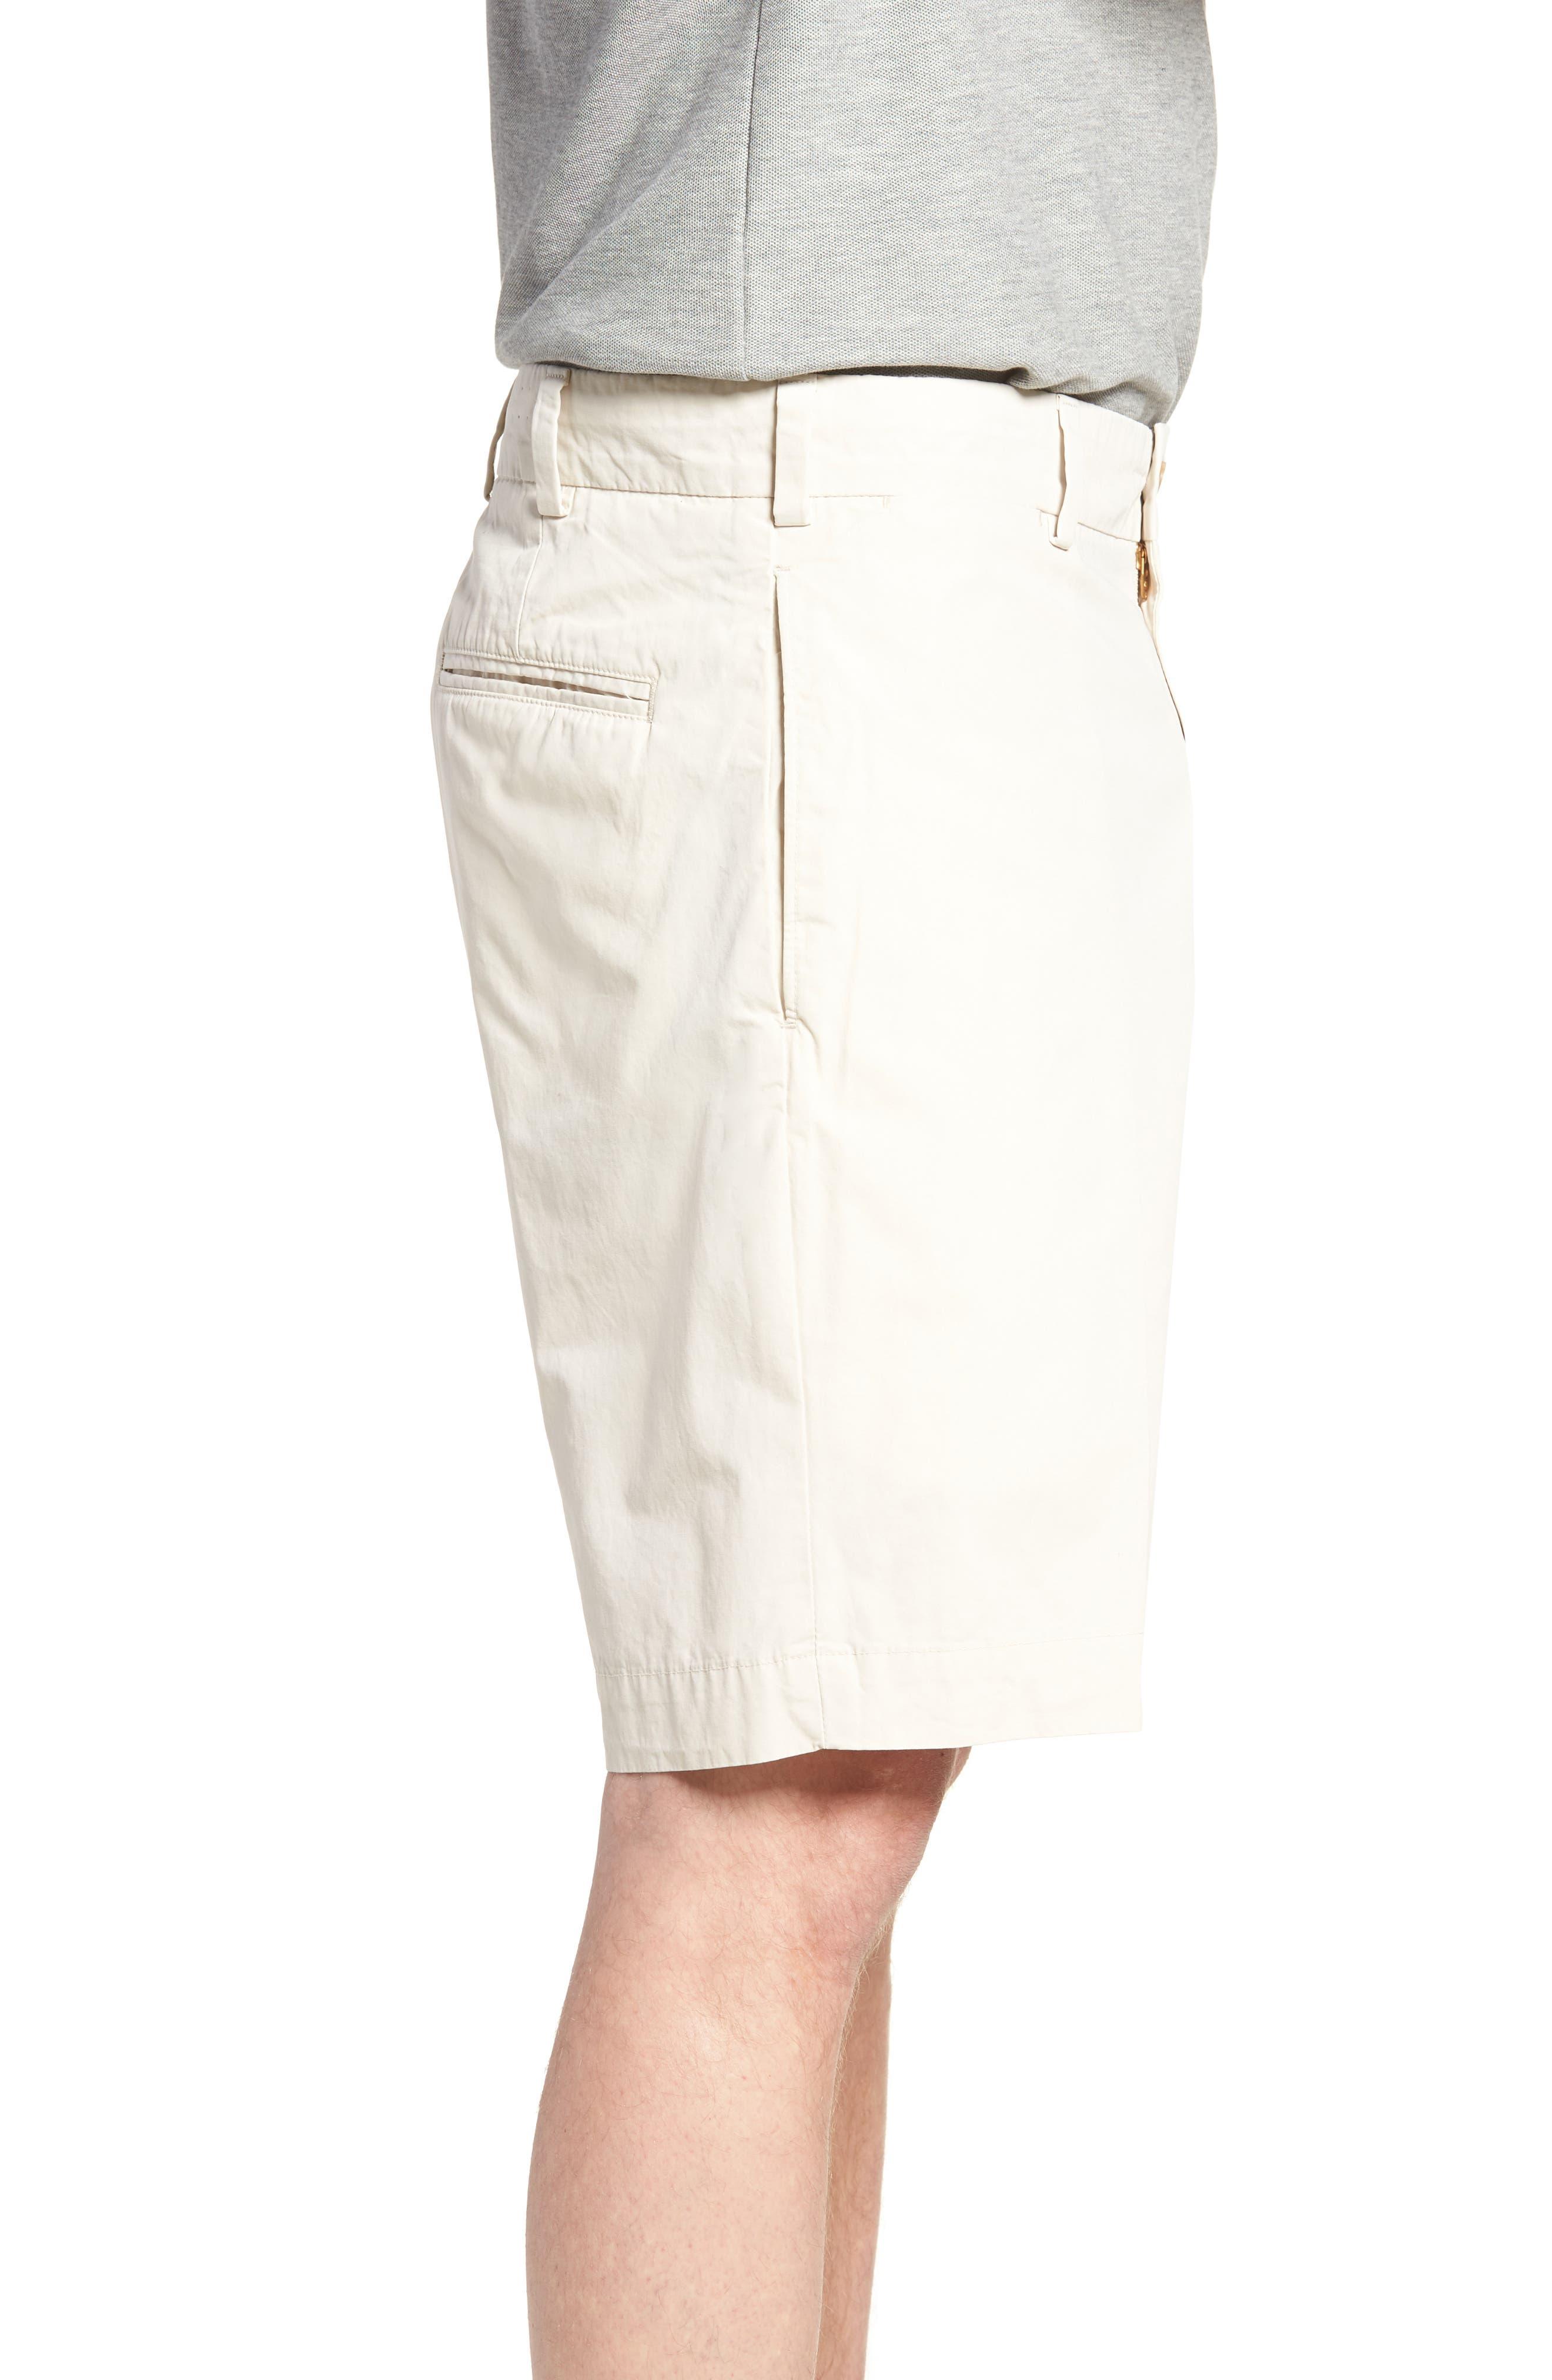 M2 Standard Fit Flat Front Tropical Cotton Poplin Shorts,                             Alternate thumbnail 3, color,                             280